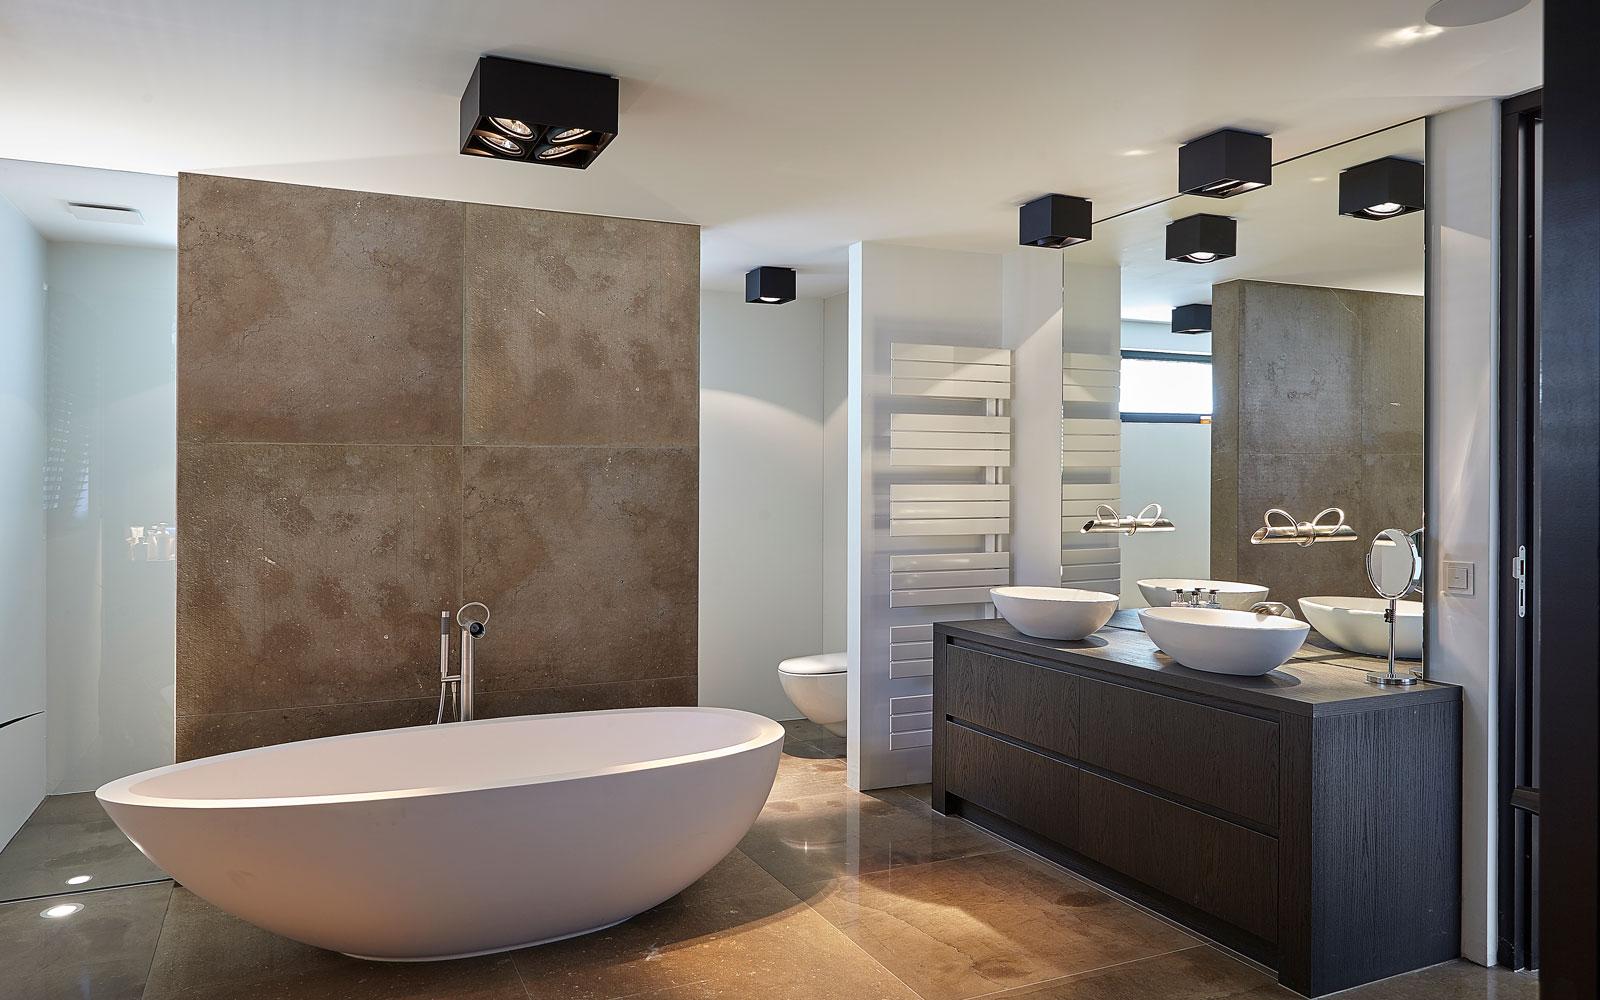 Badkamer, natuursteen, Revy Stone, vrijstaand bad, wastafel, grote spiegel, ultramoderne villa, Bob Manders